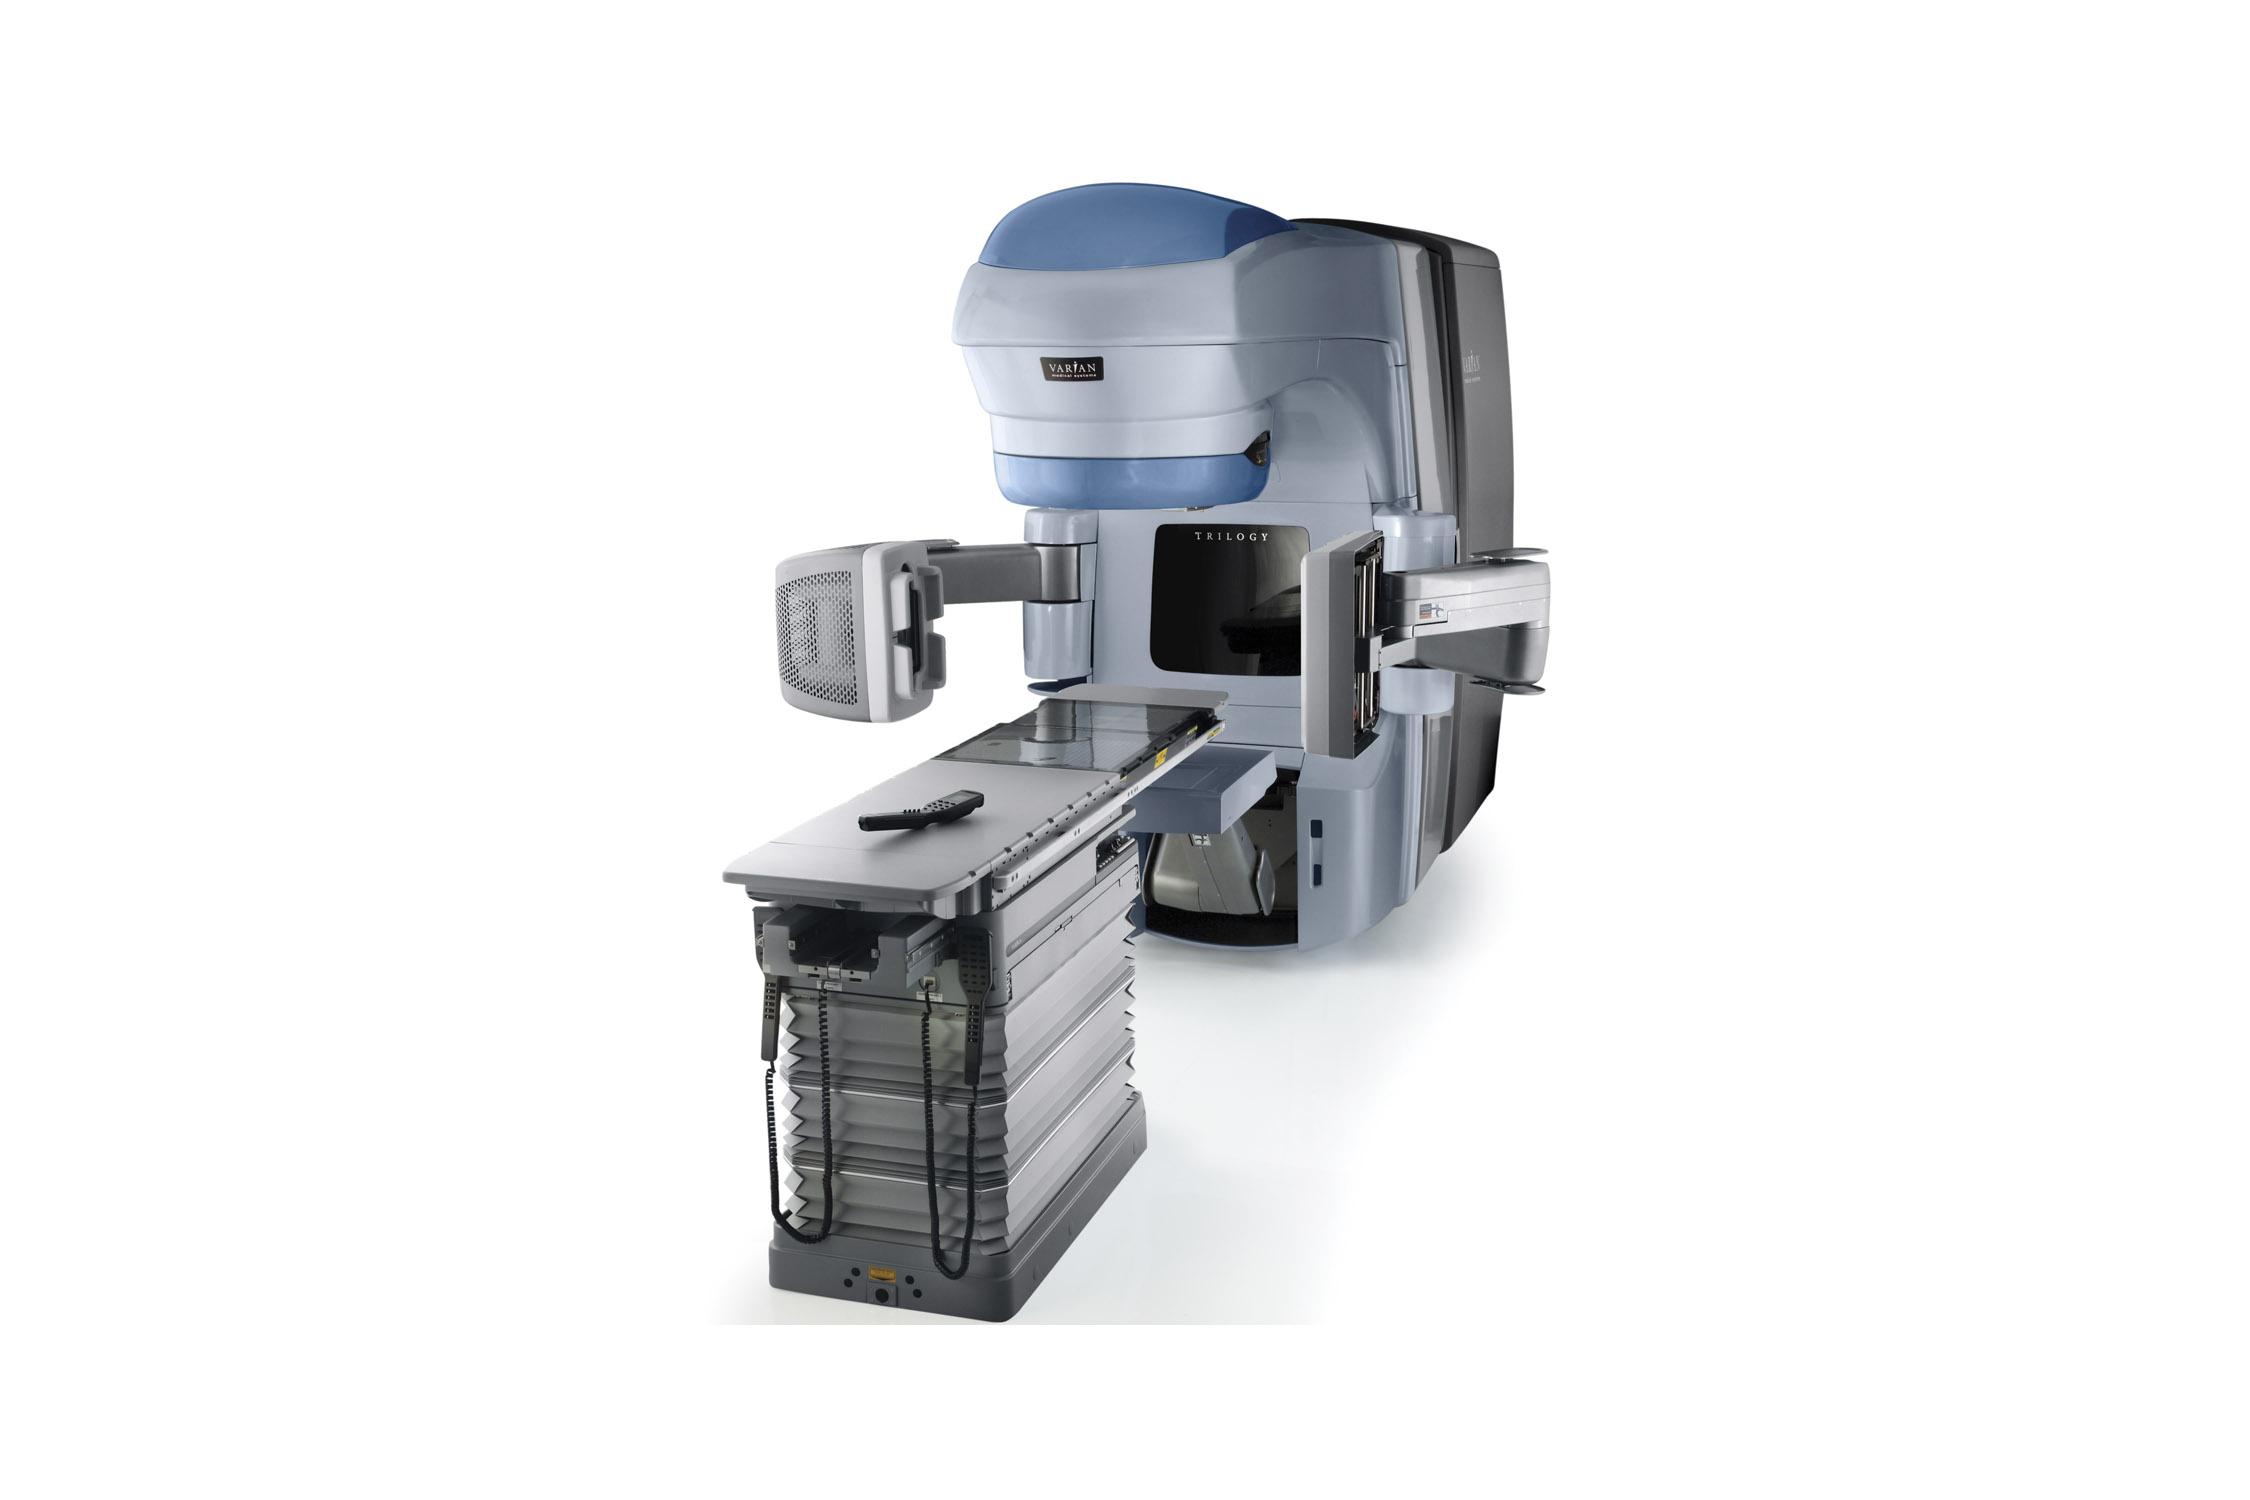 Trilogy Acclerator medical equipment